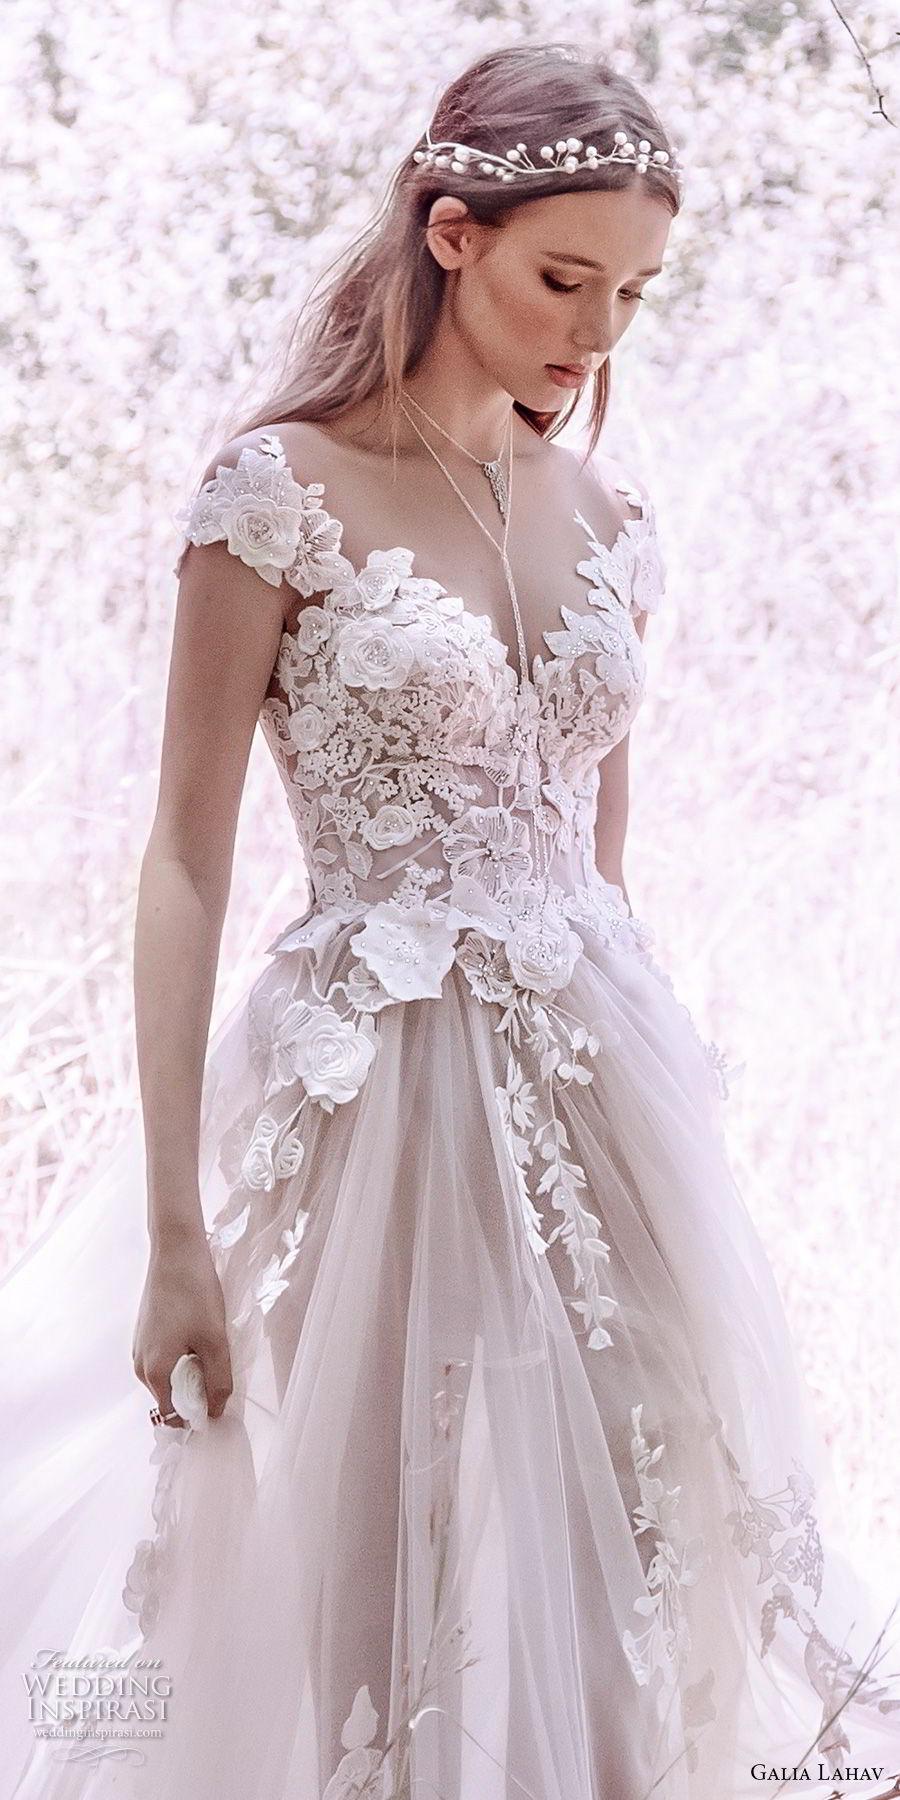 Gala by galia lahav 2018 wedding dresses crazyforus gala by galia lahav 2018 wedding dresses junglespirit Images